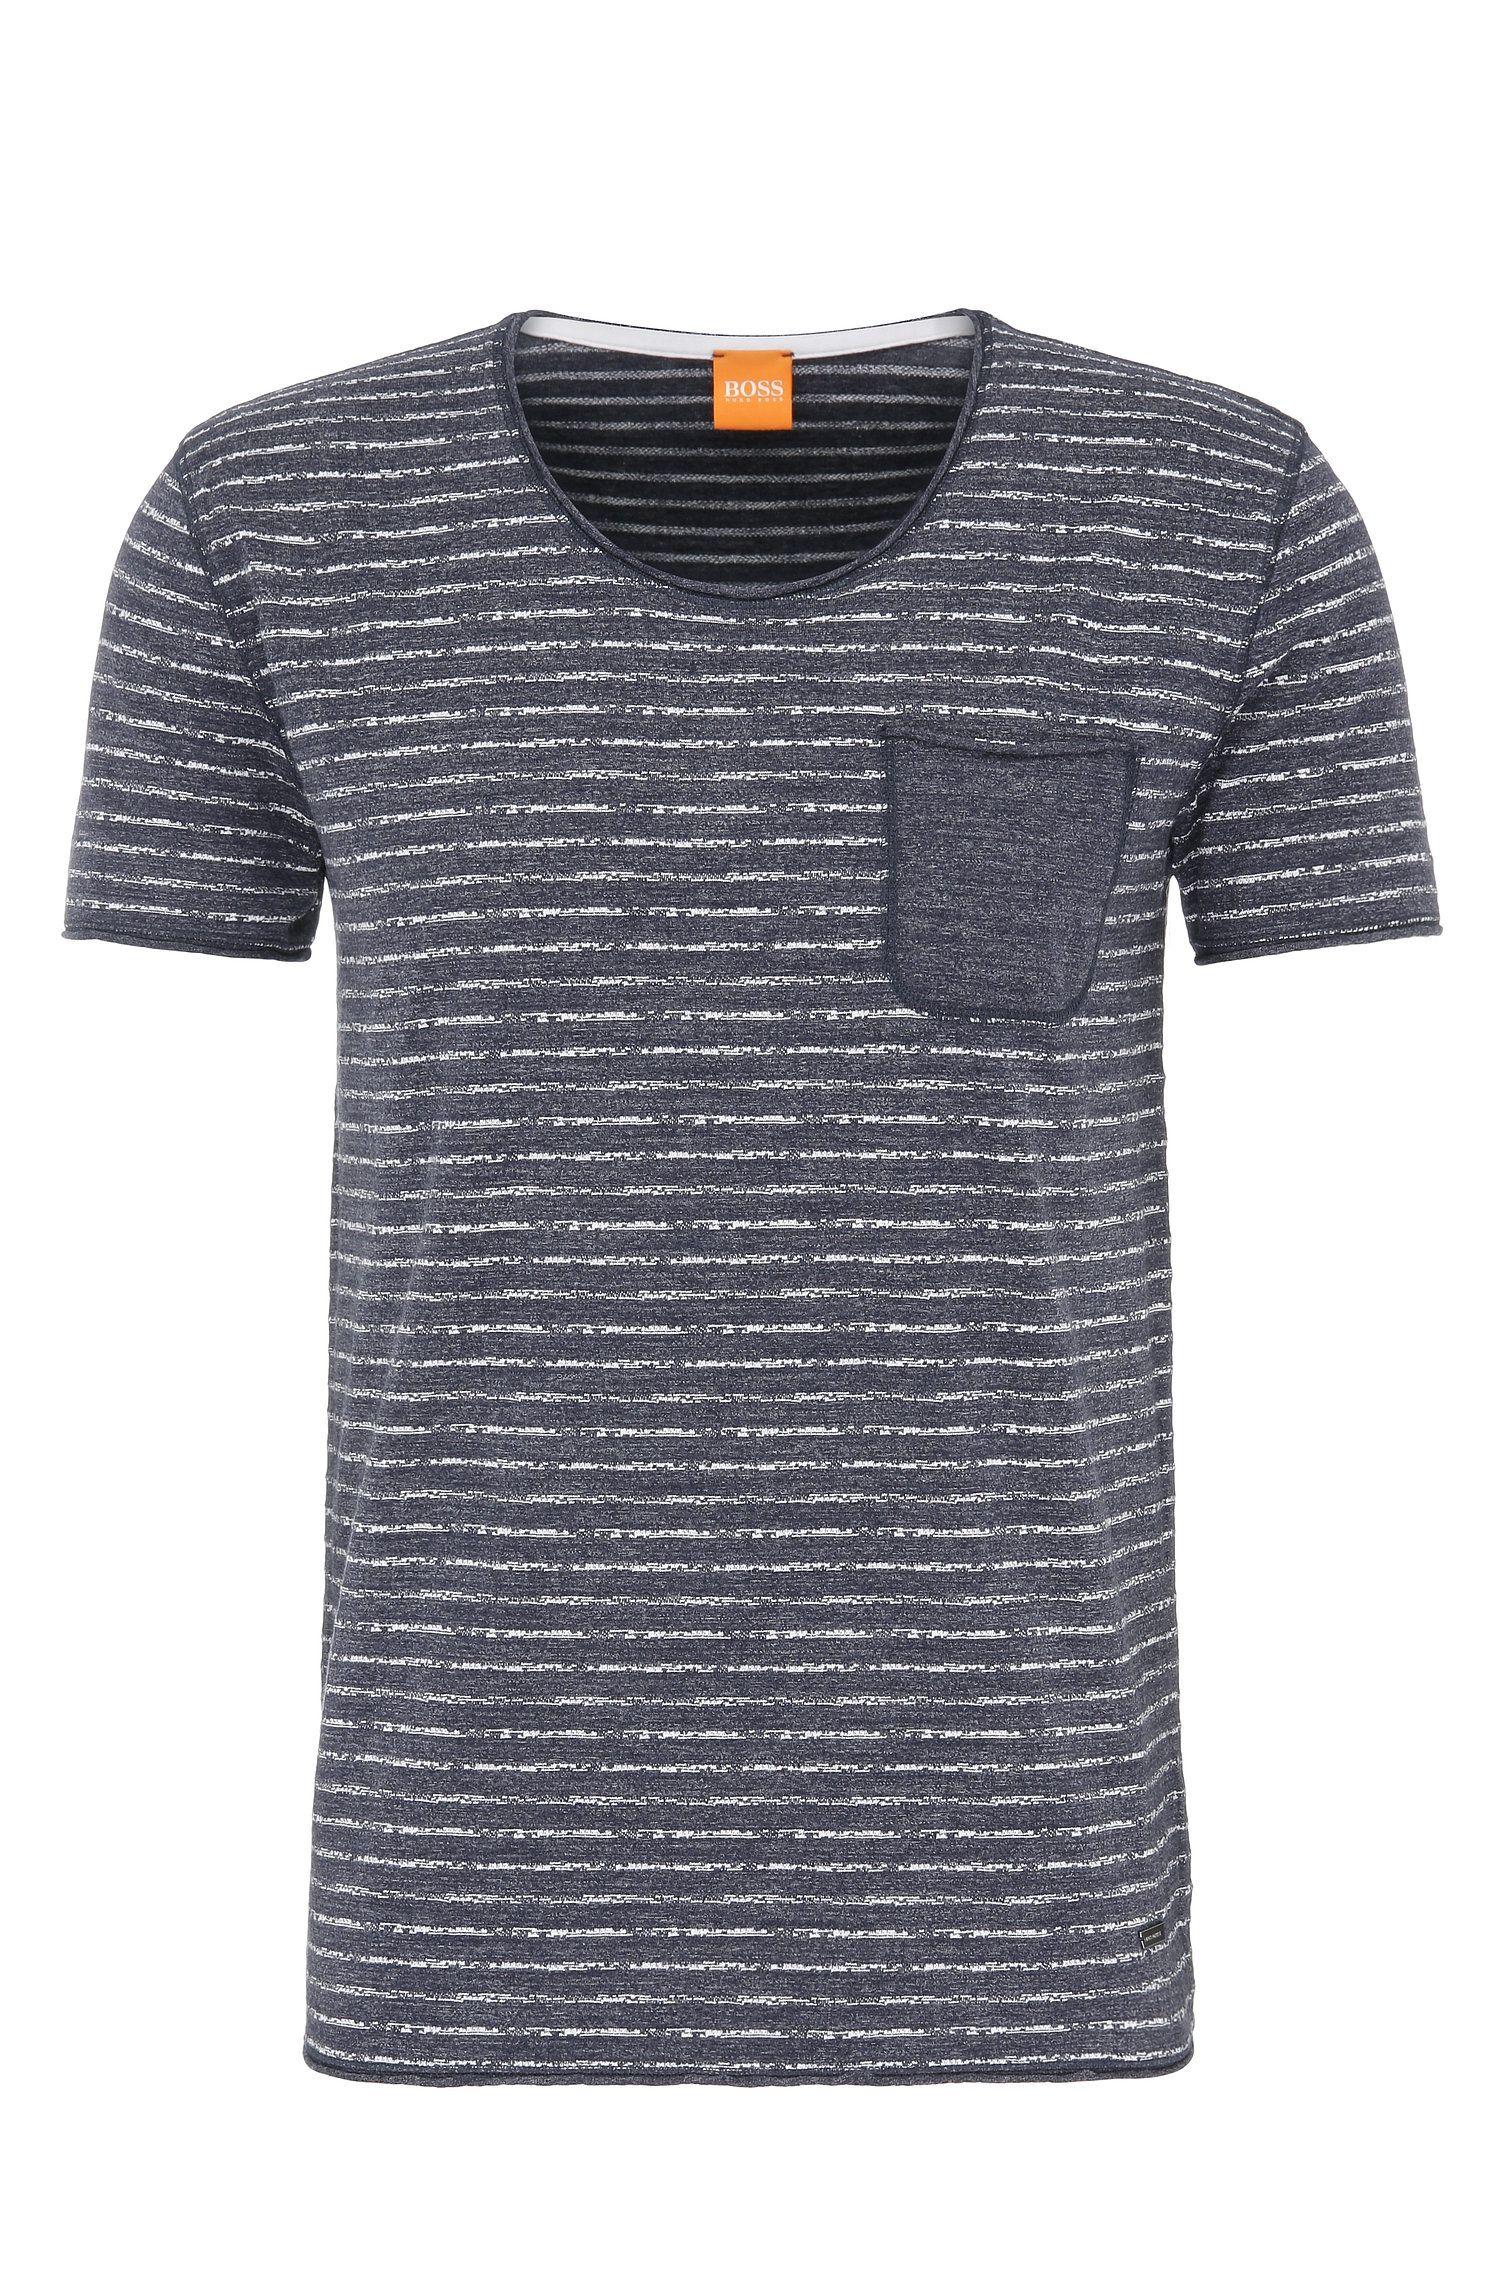 Cotton Stripe Pocket T-Shirt   Toa